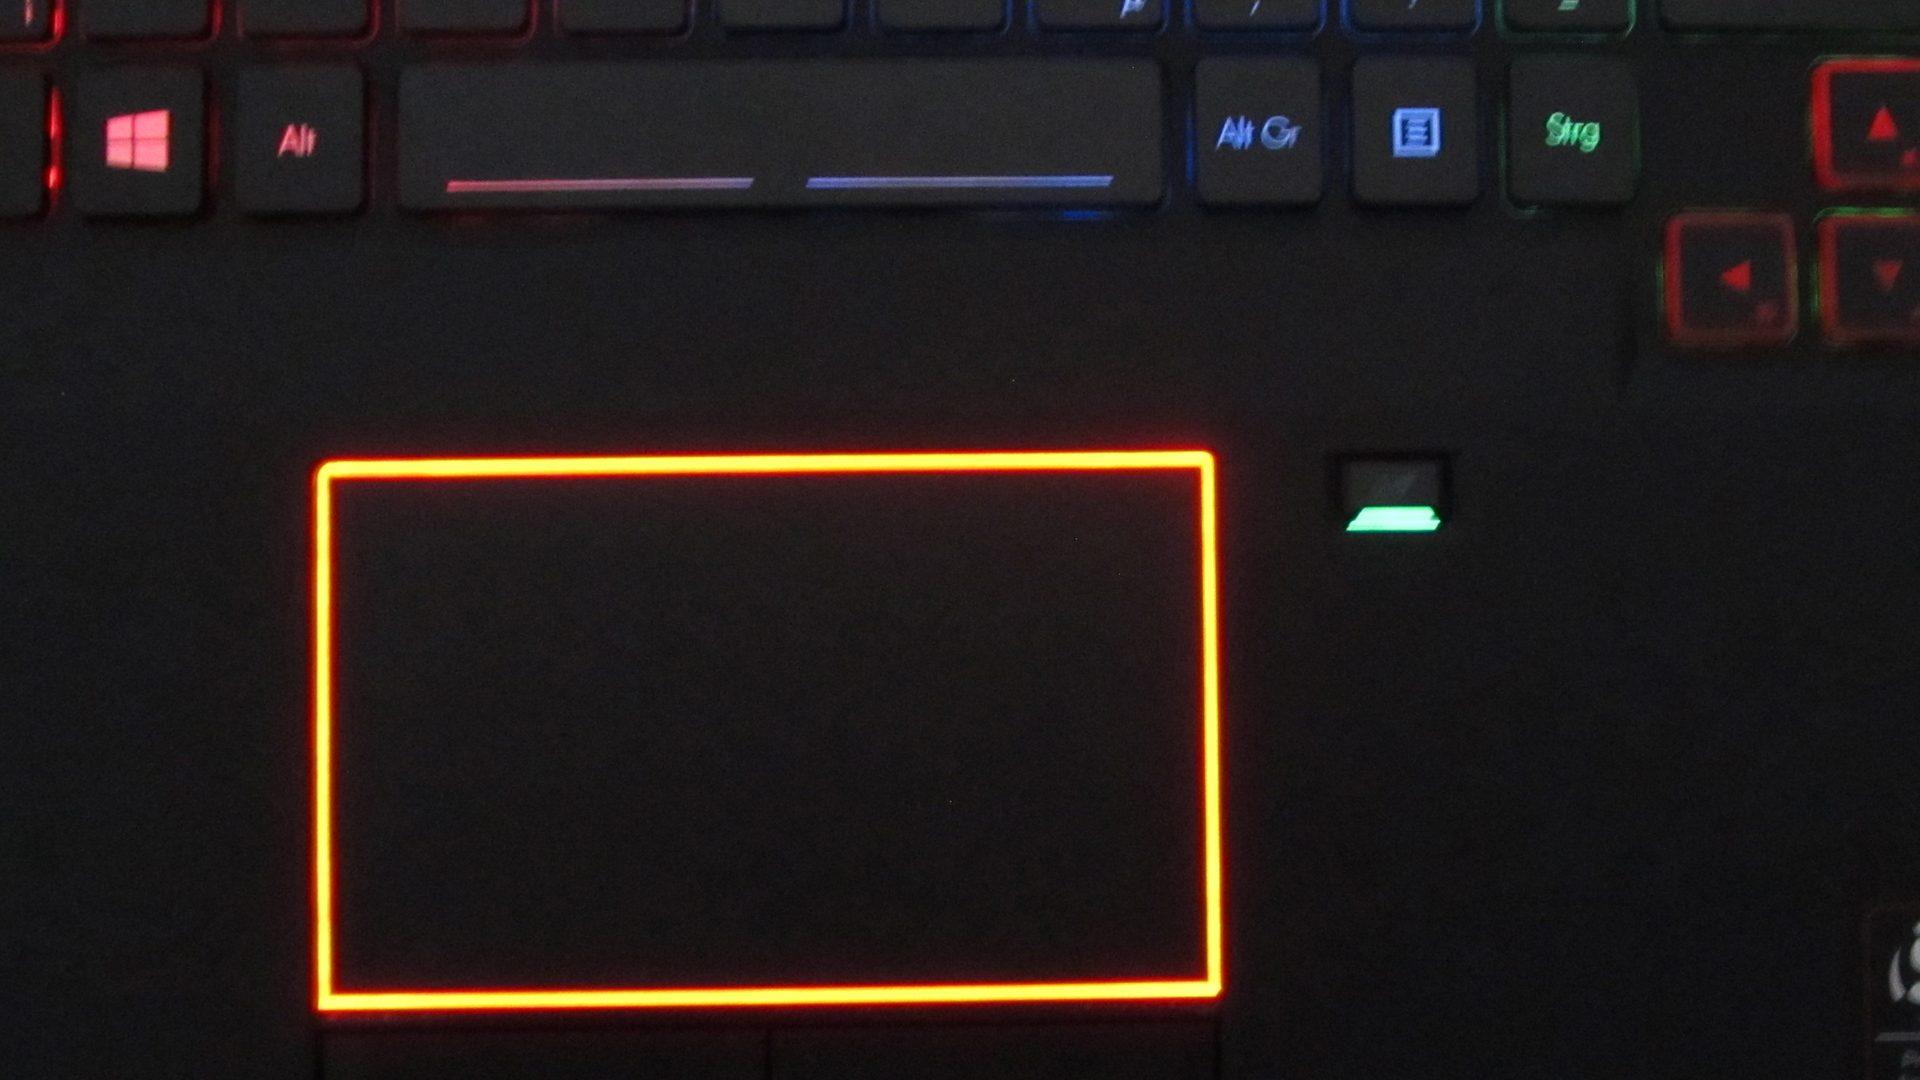 Acer-Predator-17-G9-793-718-Tastatur_6